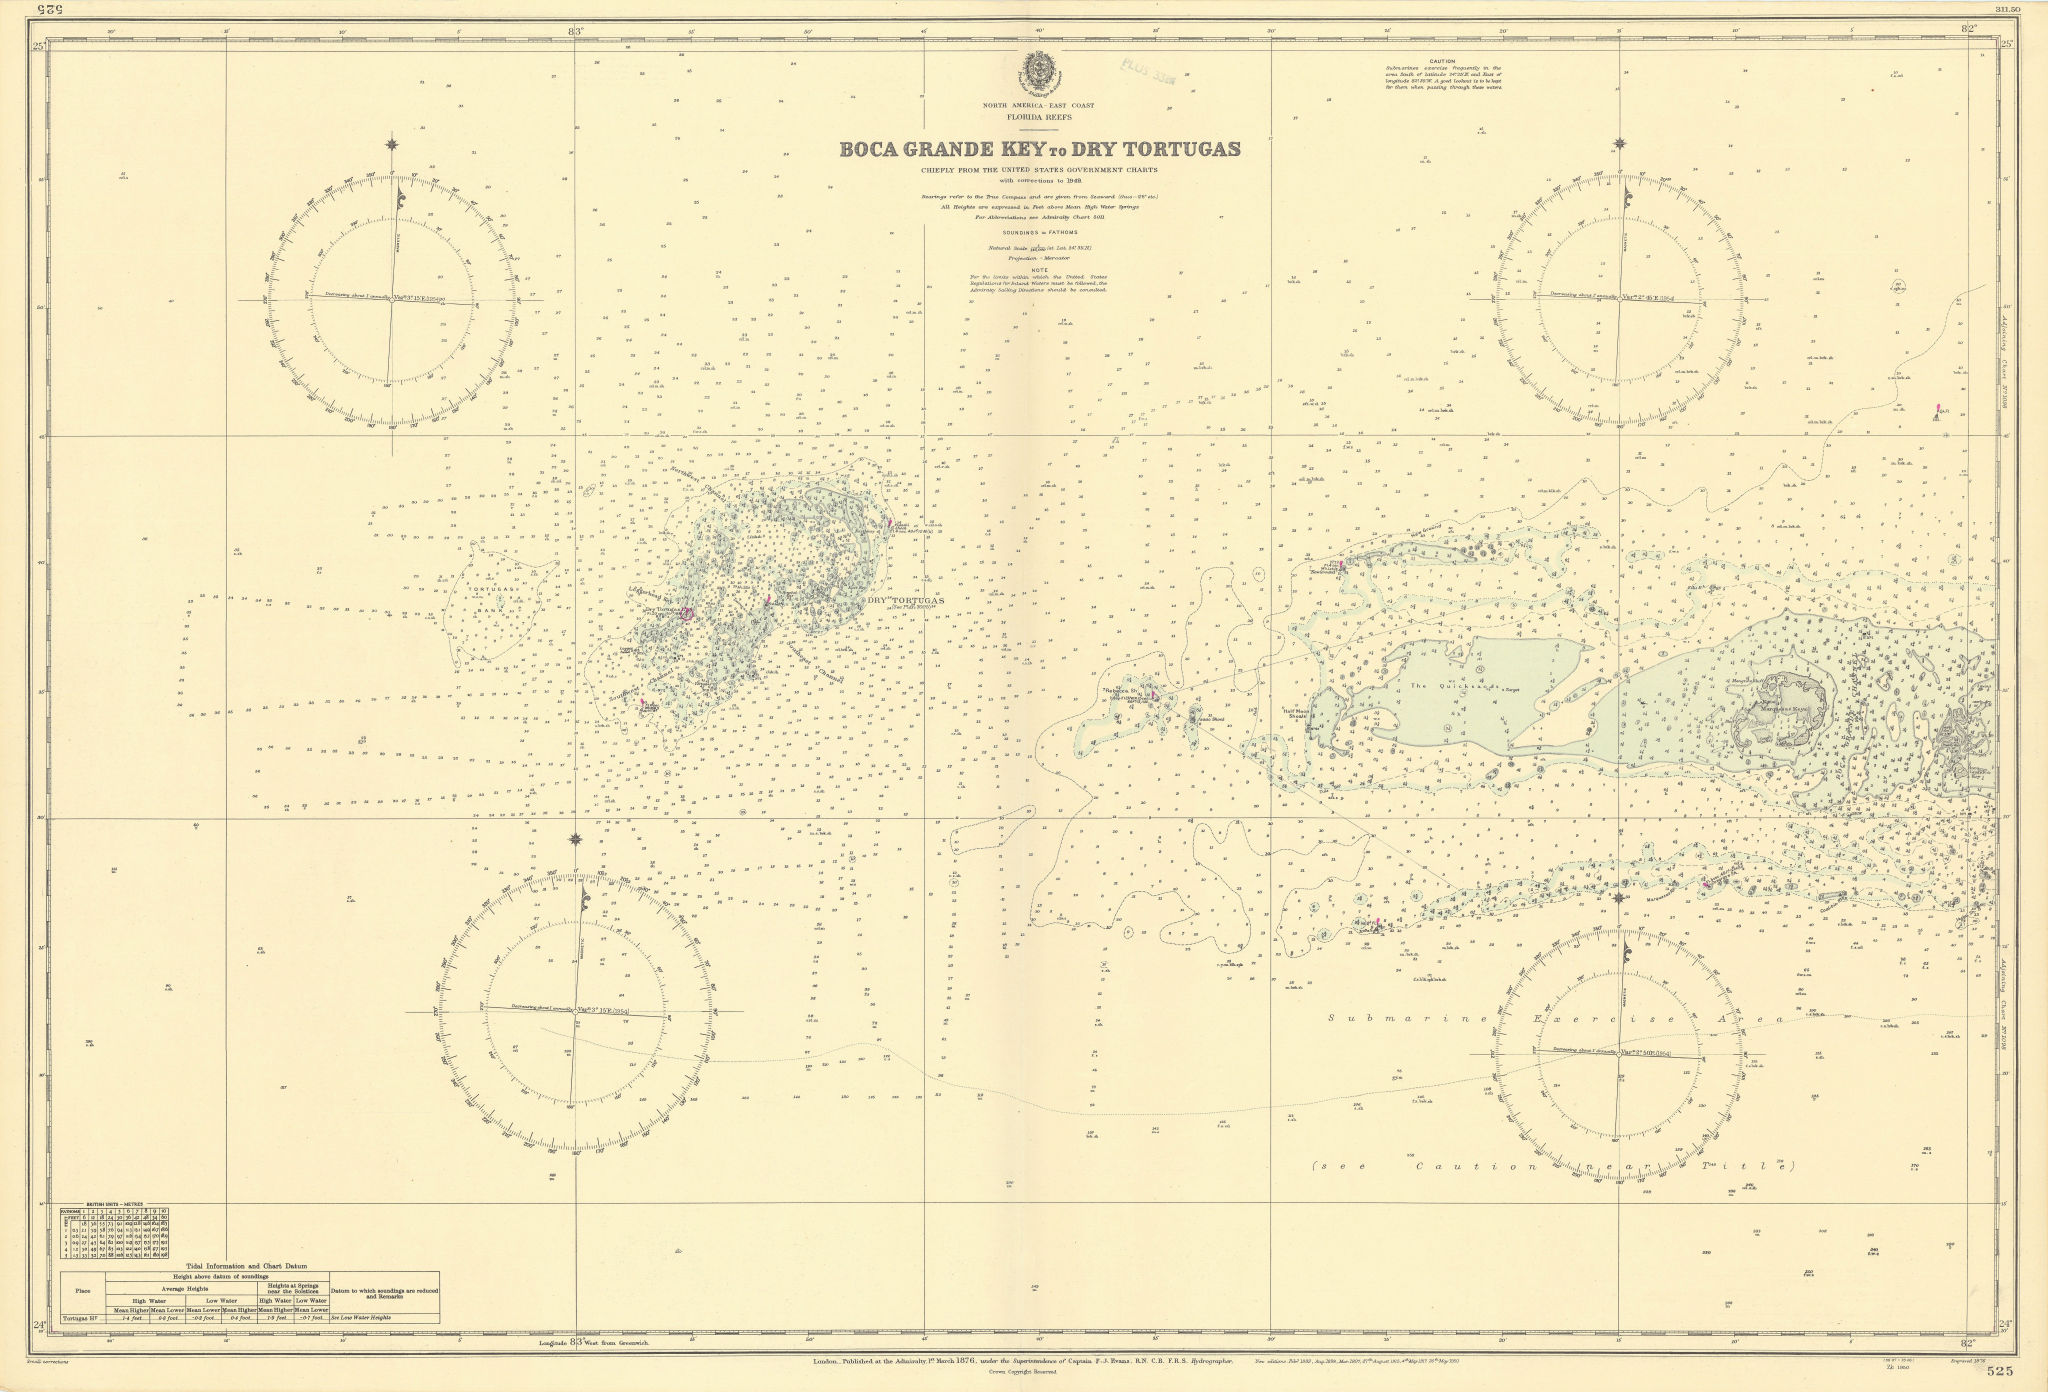 Florida Keys Boca Grande Marquesas Dry Tortugas ADMIRALTY chart 1876 (1950) map